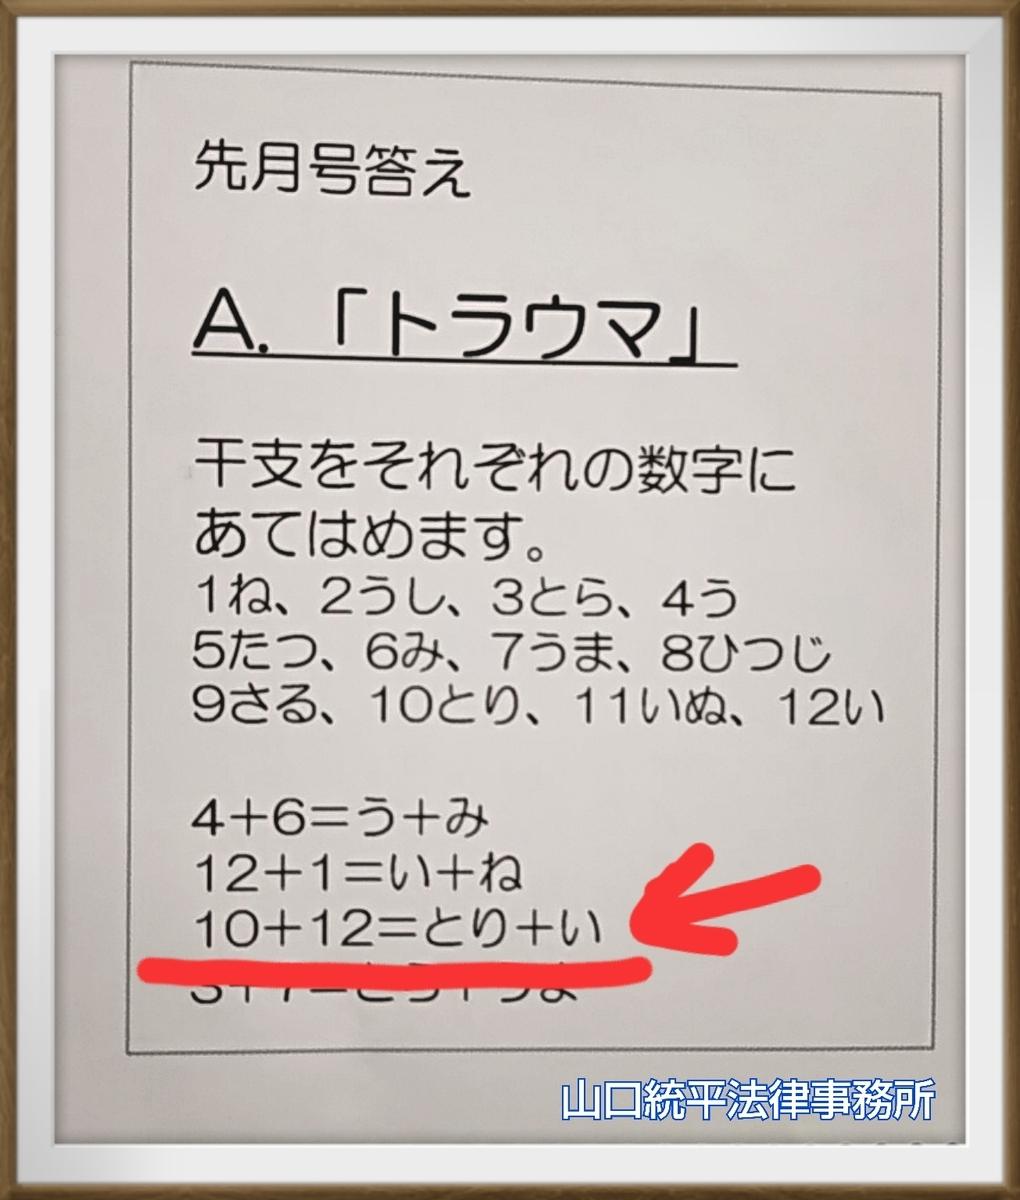 f:id:bengoshi-nagoya:20190515182136j:plain